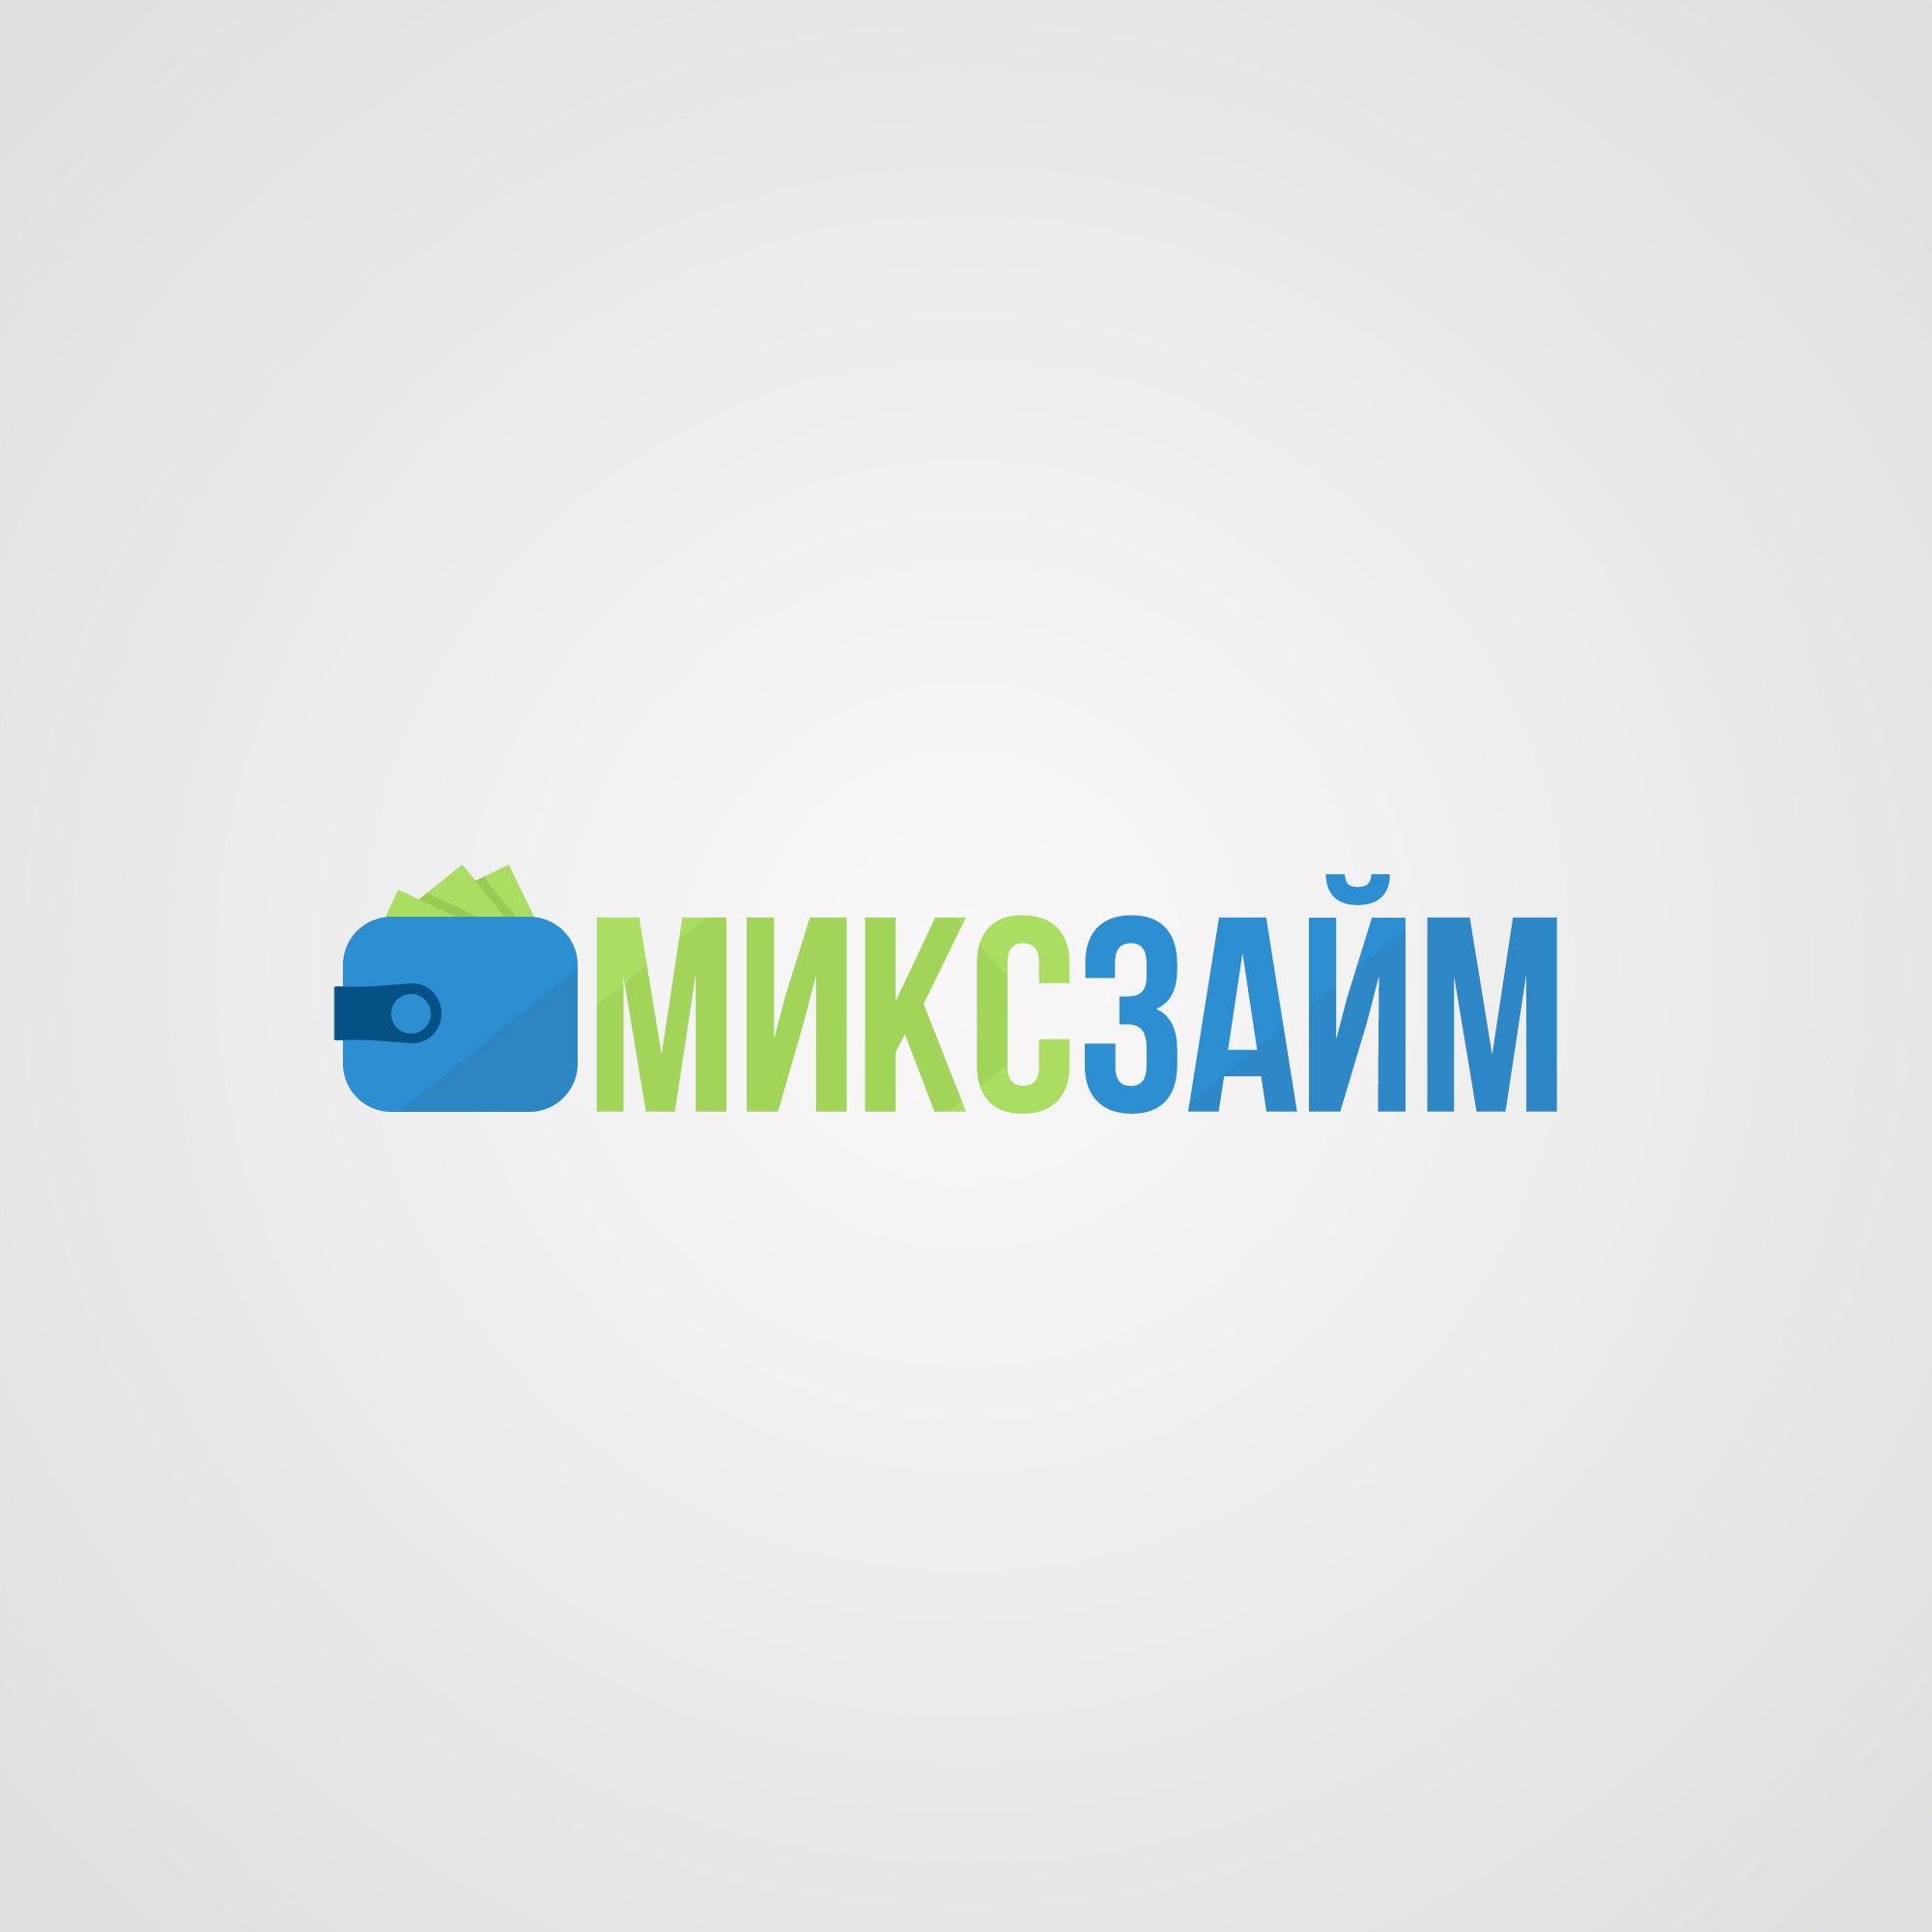 Разработать логотип фото f_5625acceaa0d64d0.jpg